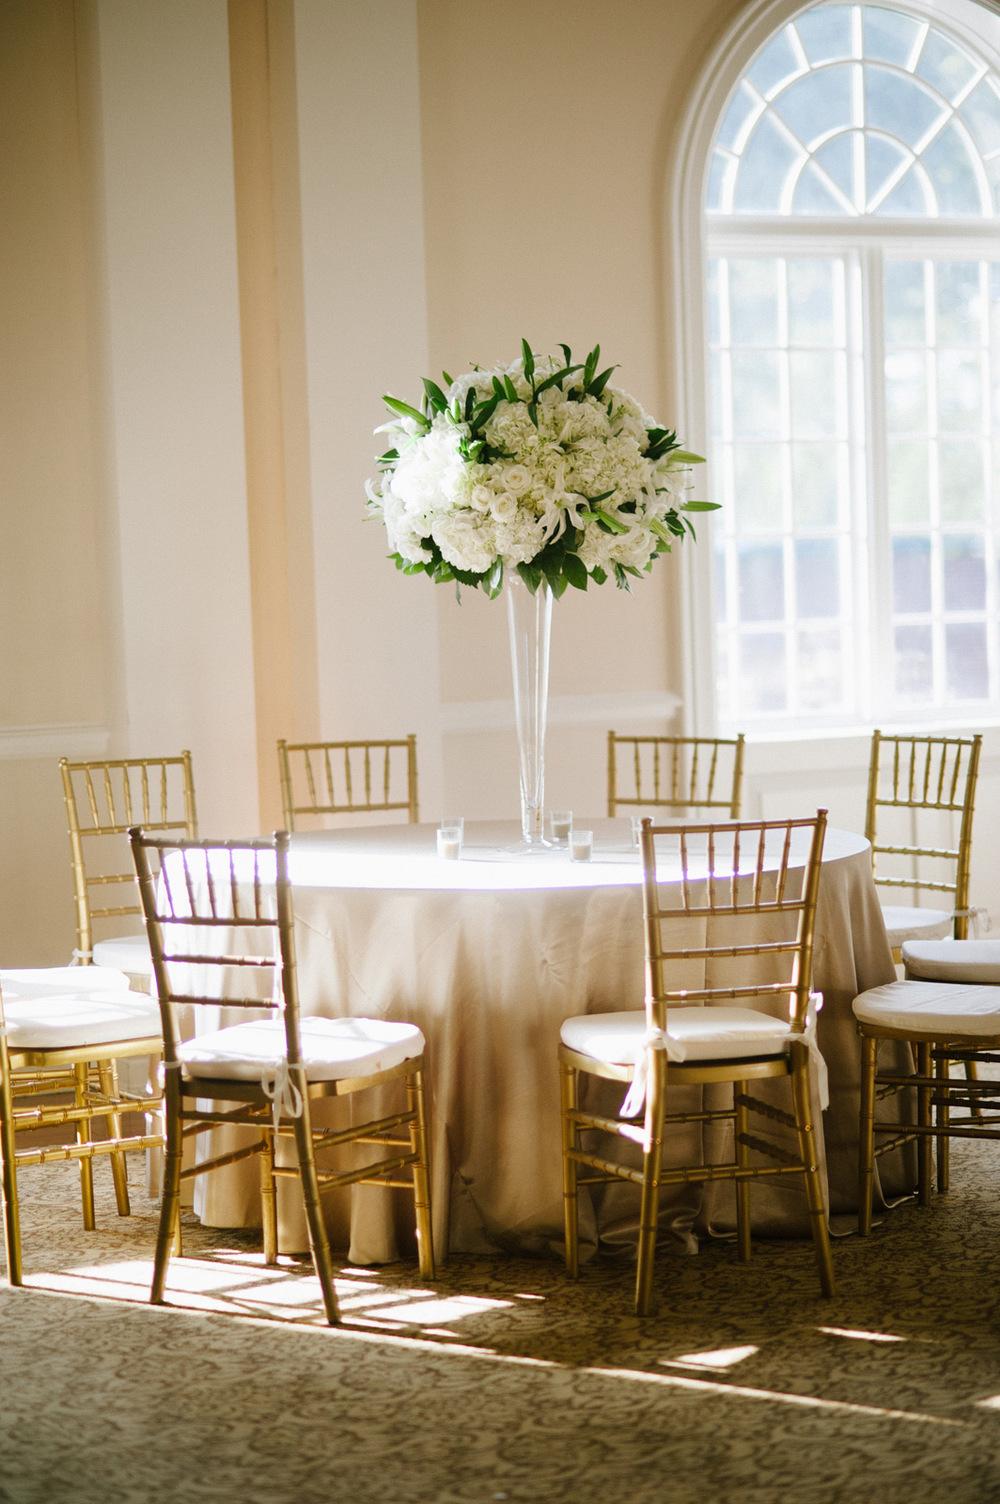 Wedding florist, River Room at St. Paul's, Augusta GA.